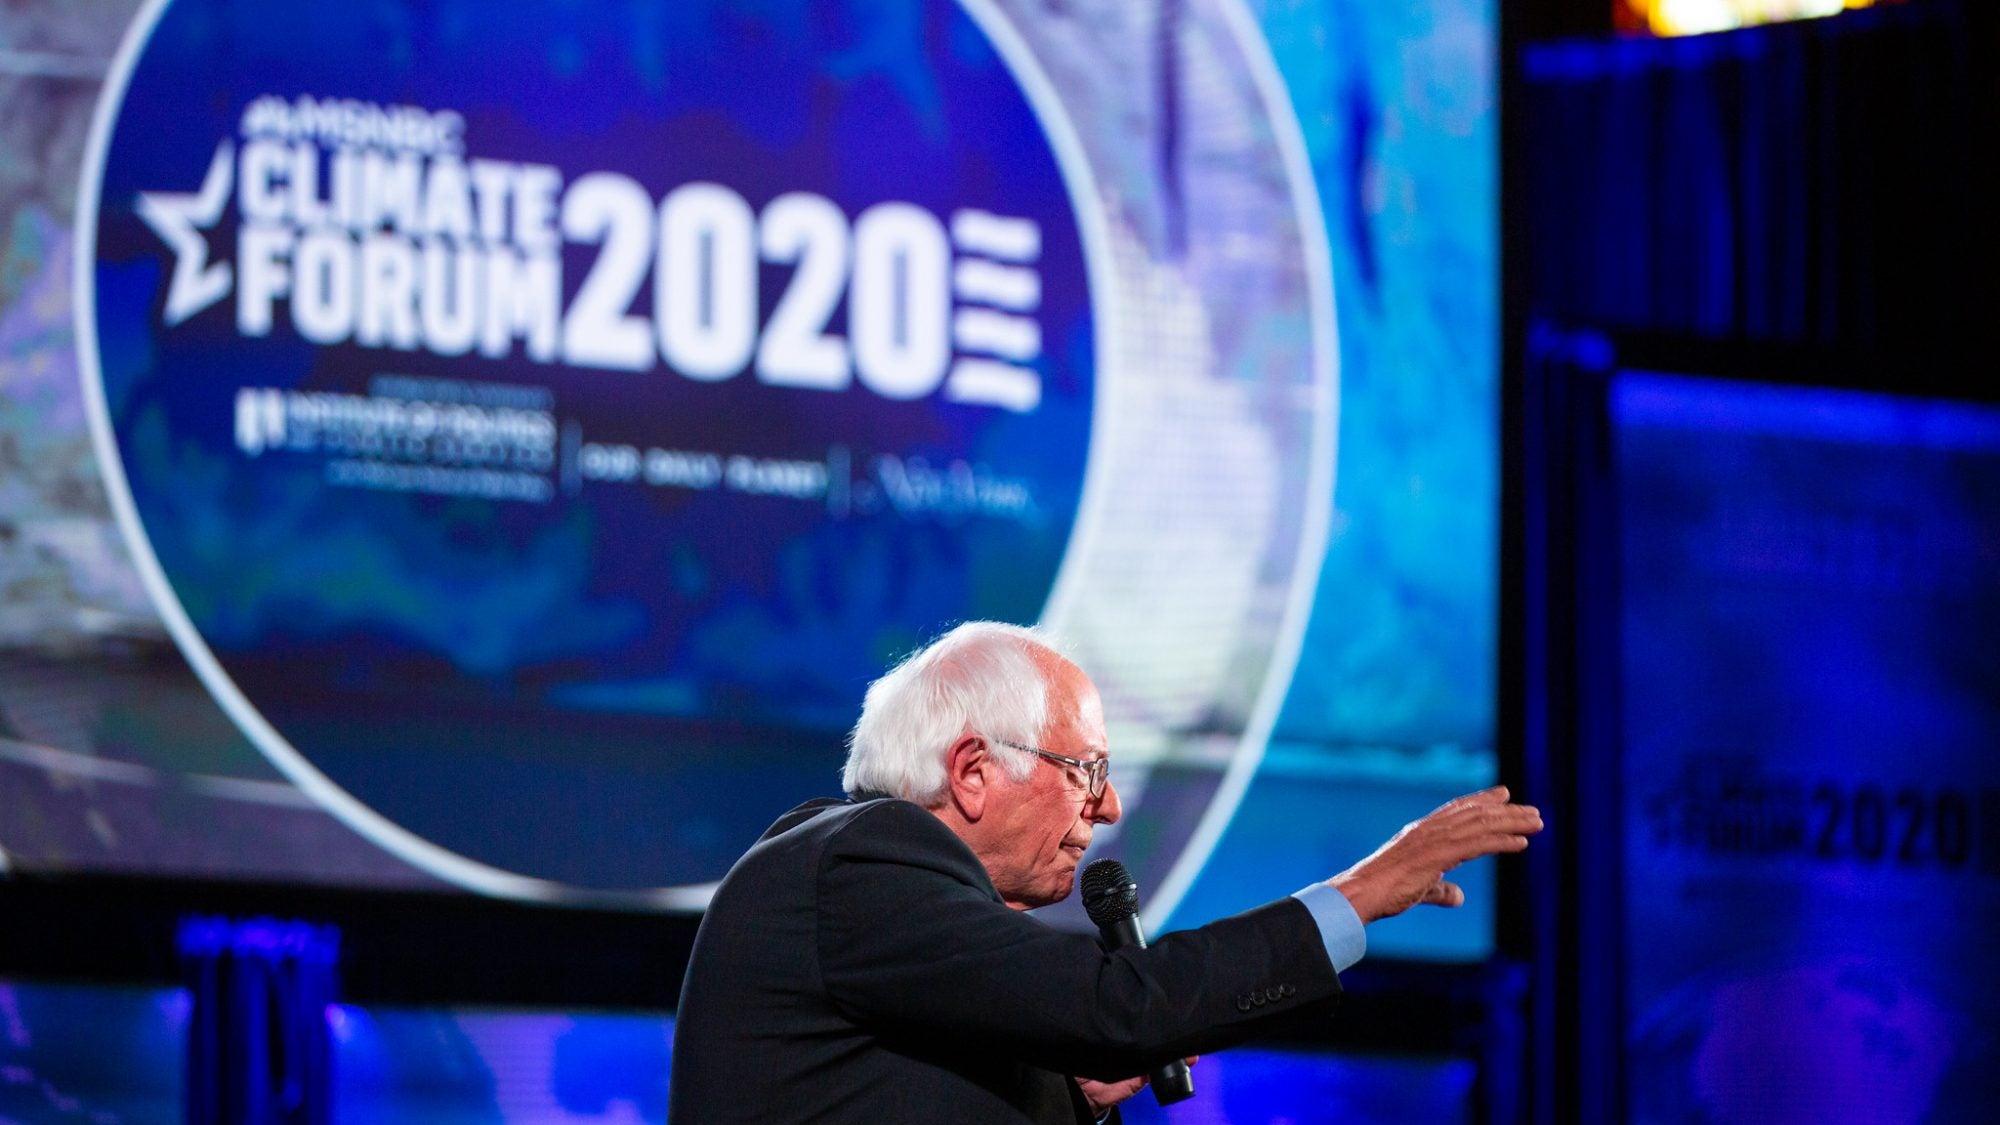 Climate Forum - Bernie Sanders